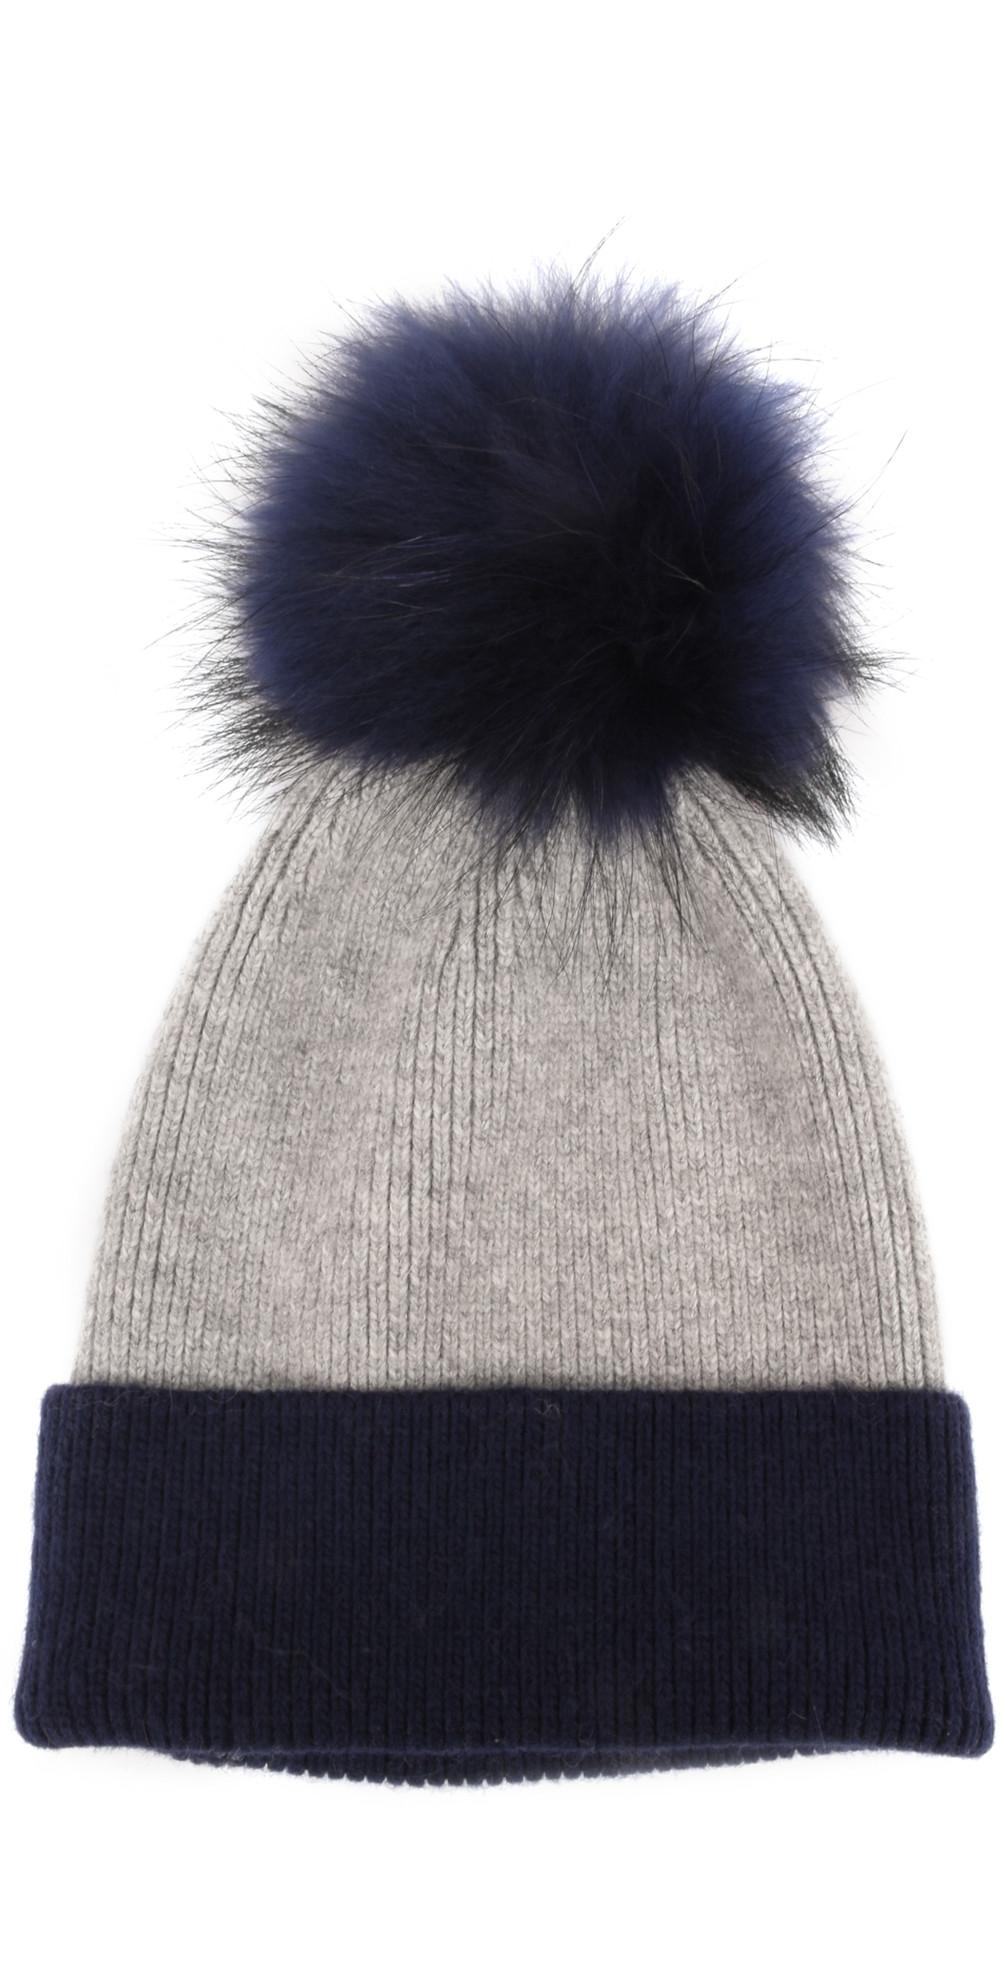 Lola B Hat with Pom main image